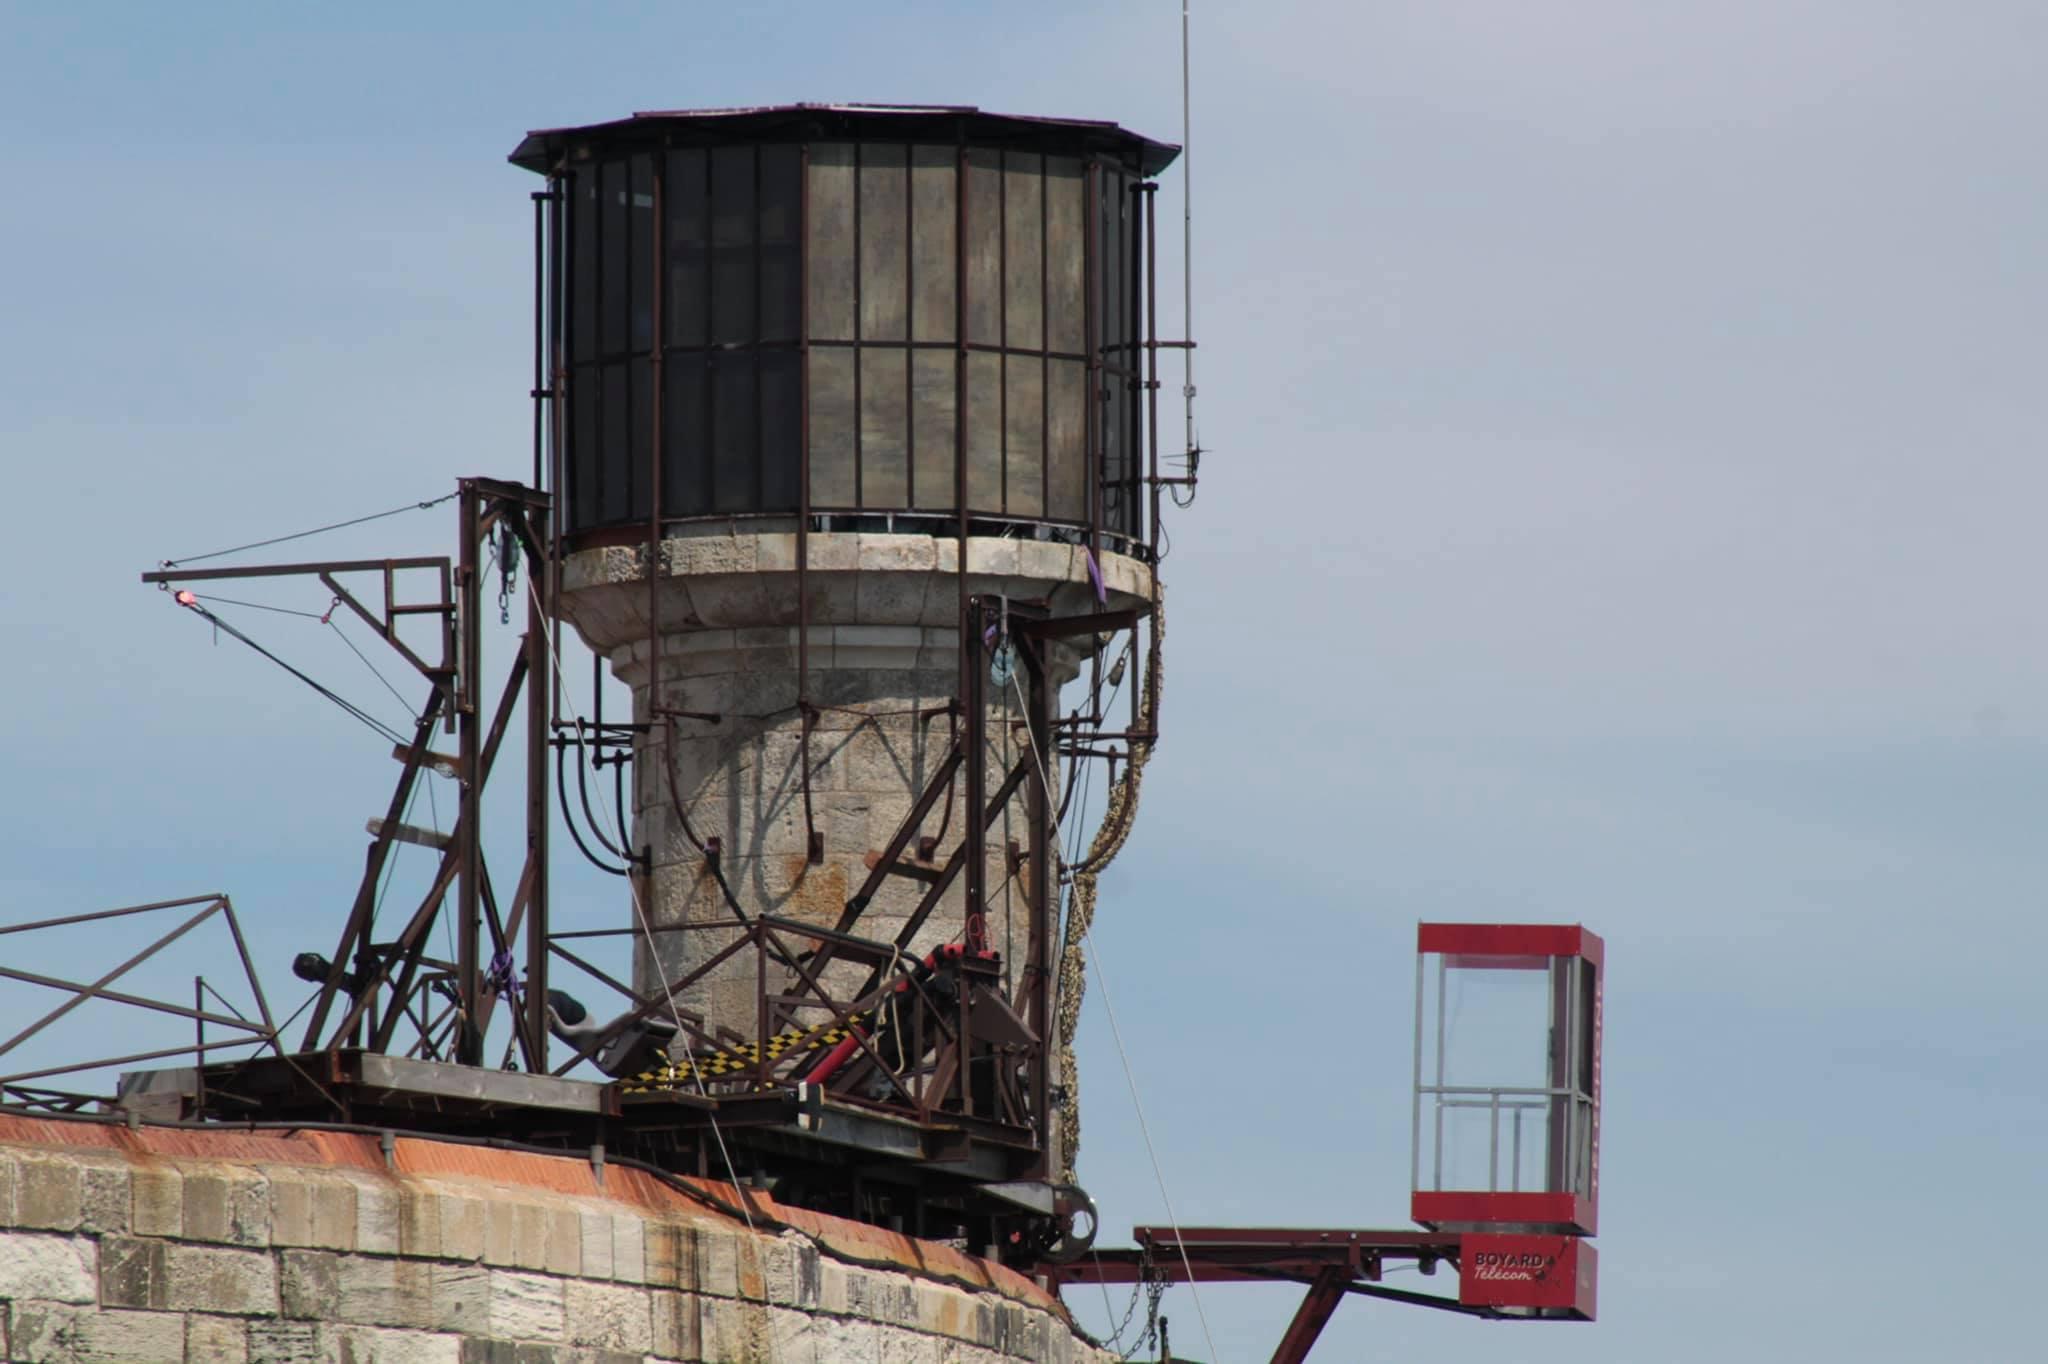 Photos des tournages Fort Boyard 2021 (production + candidats) - Page 6 18329211